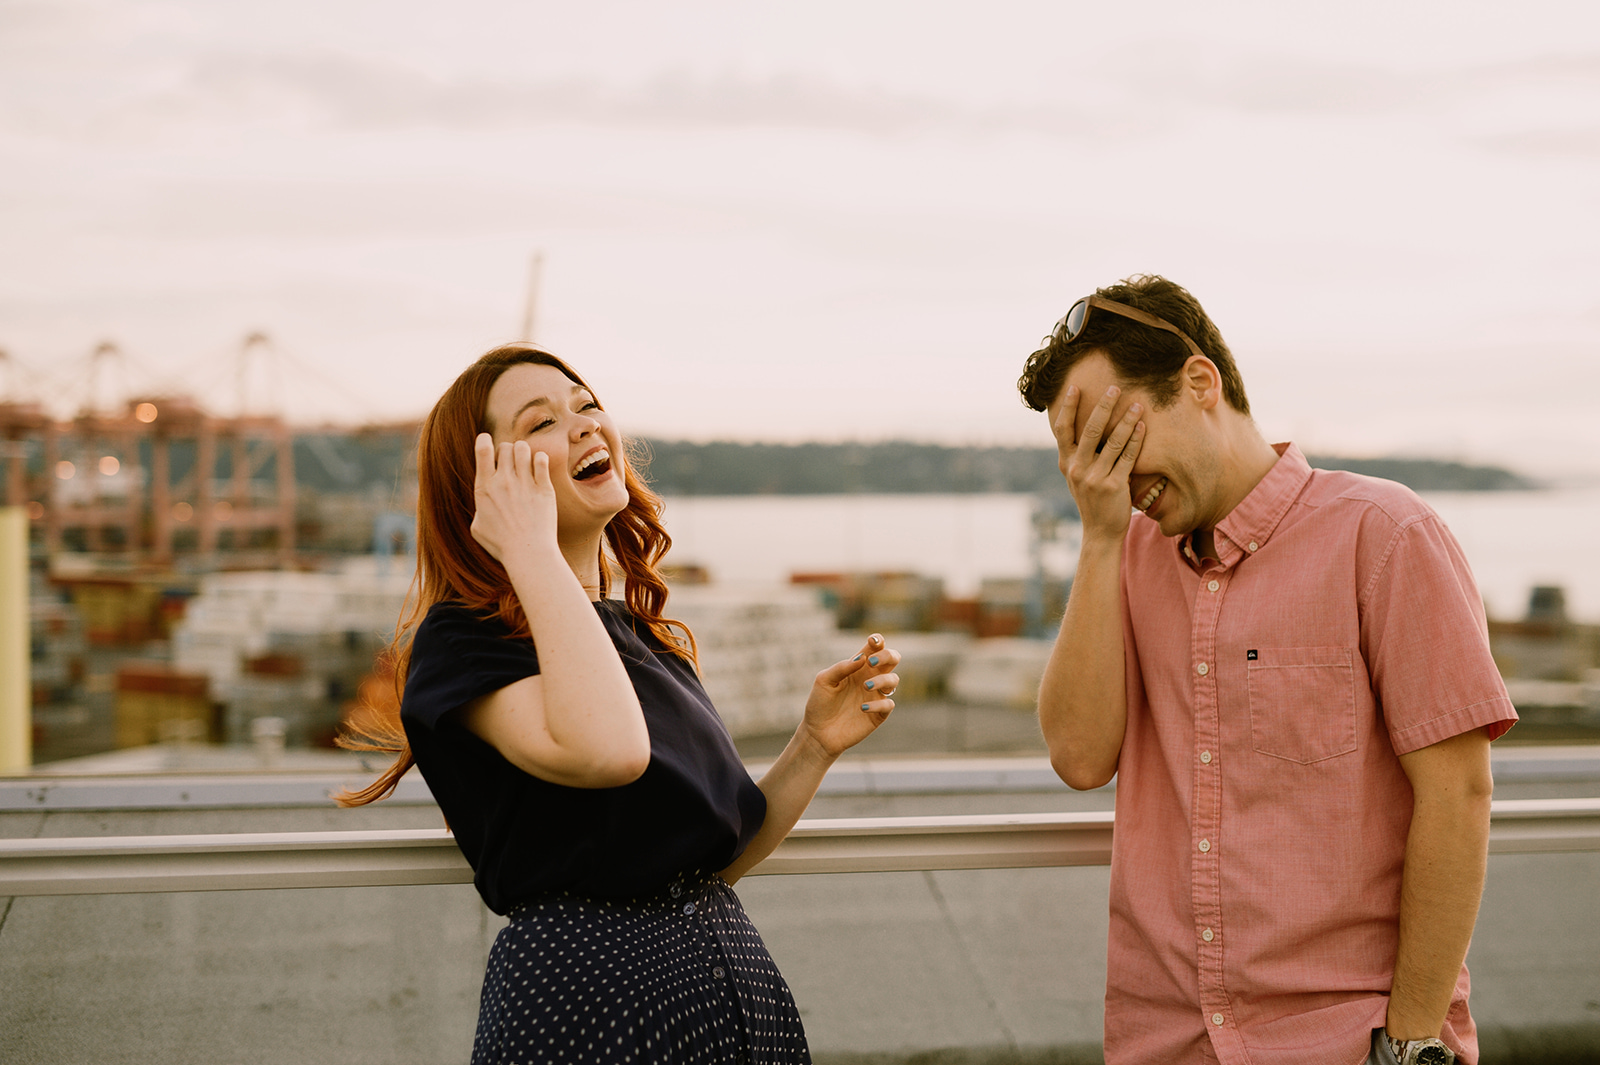 Rebecca-Christian-Engagement-Carly-Bish-Photography-102.jpg